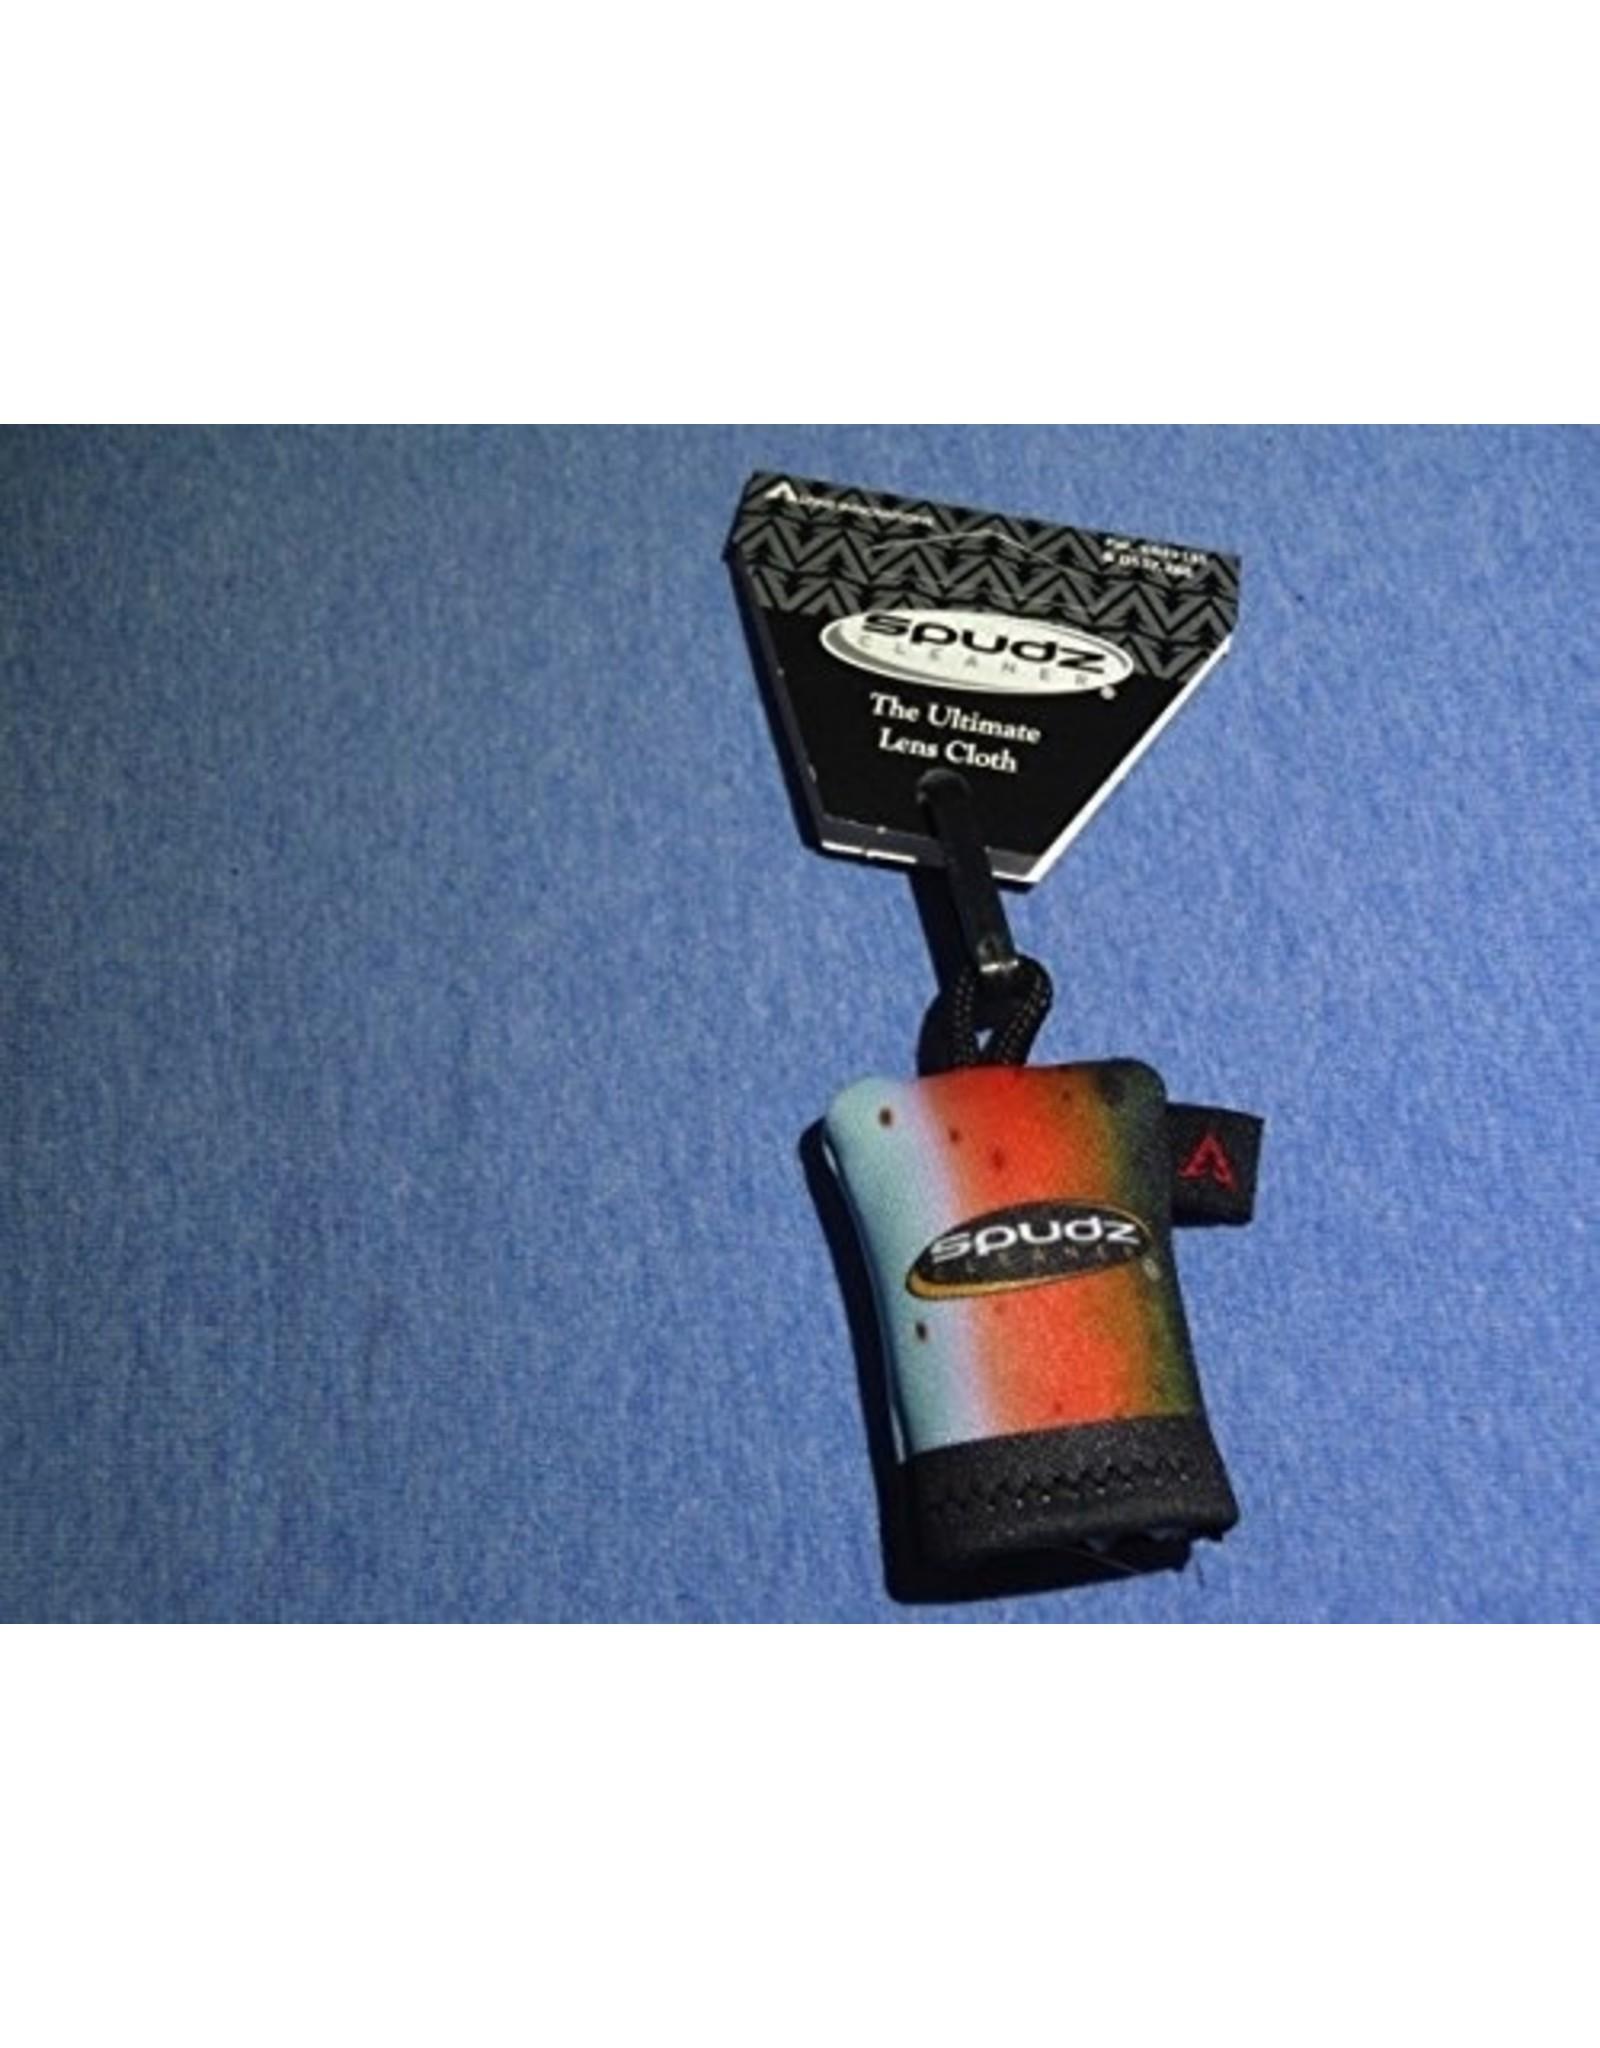 AA Spudz Classic Microfiber Cloth